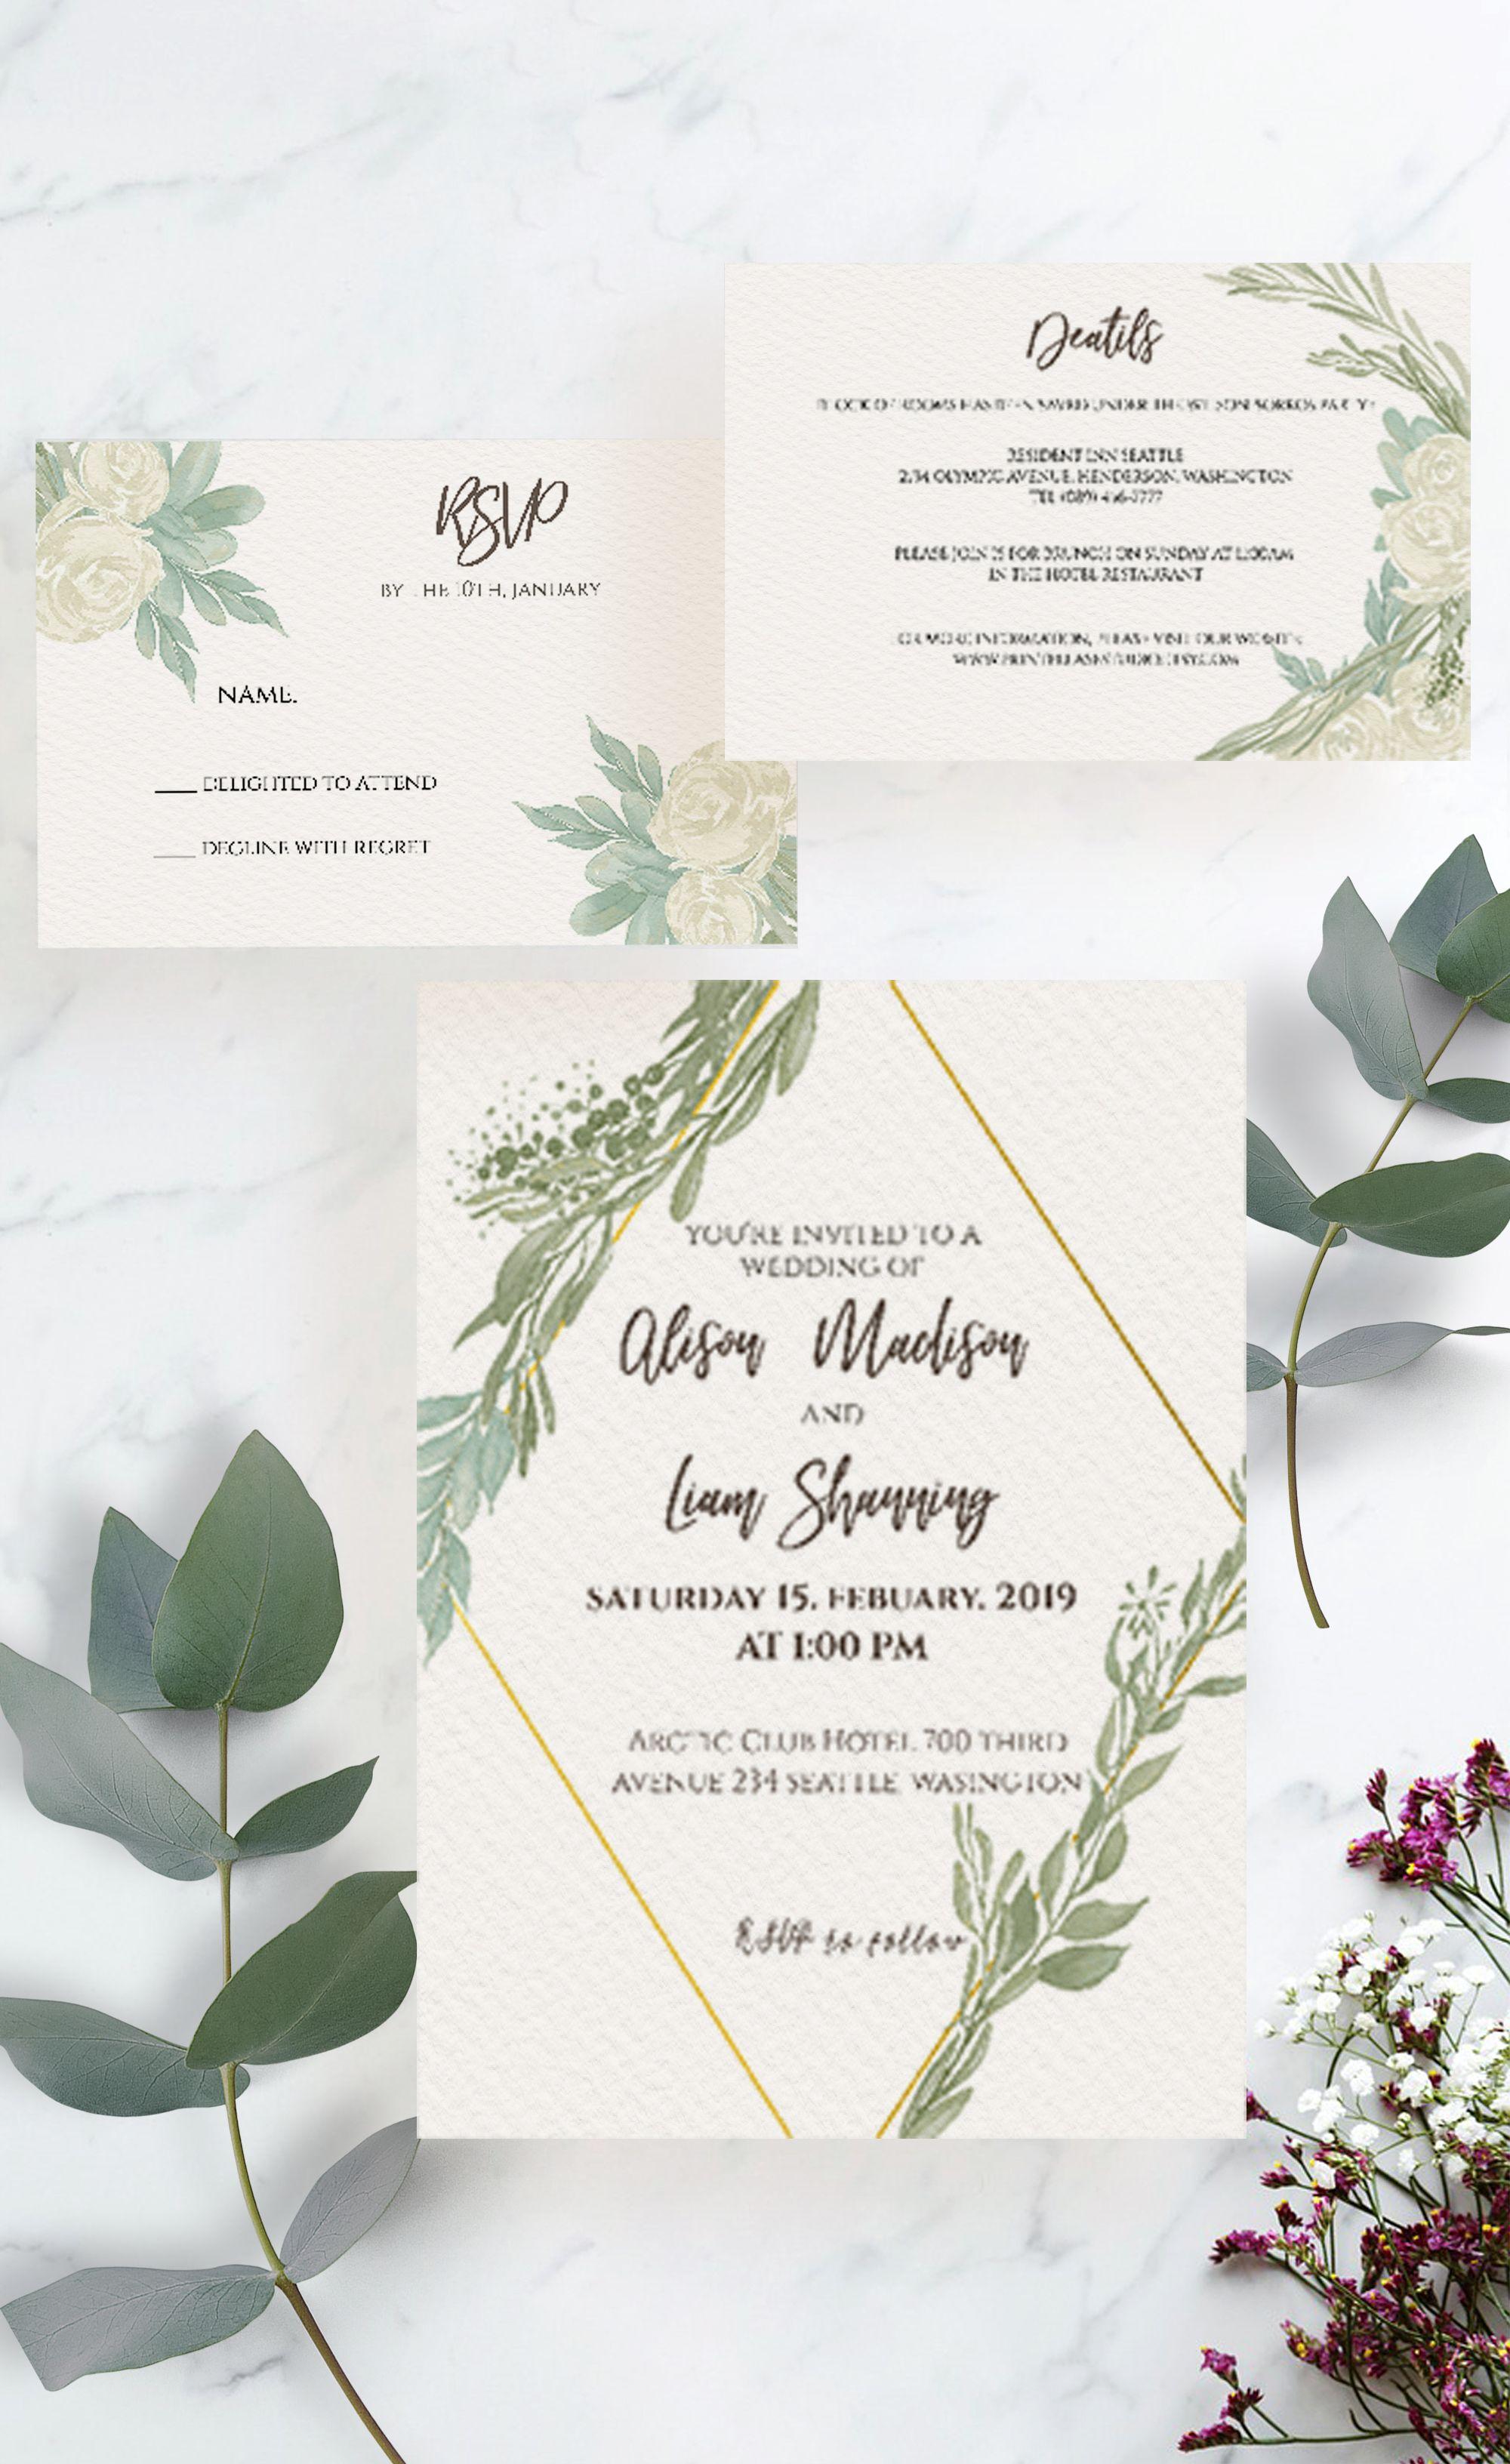 Greenery Wedding Invitation Rustic Wedding Invitation Etsy Rustic Wedding Invitation Set Wedding Invitation Templates Rustic Greenery Wedding Invitations